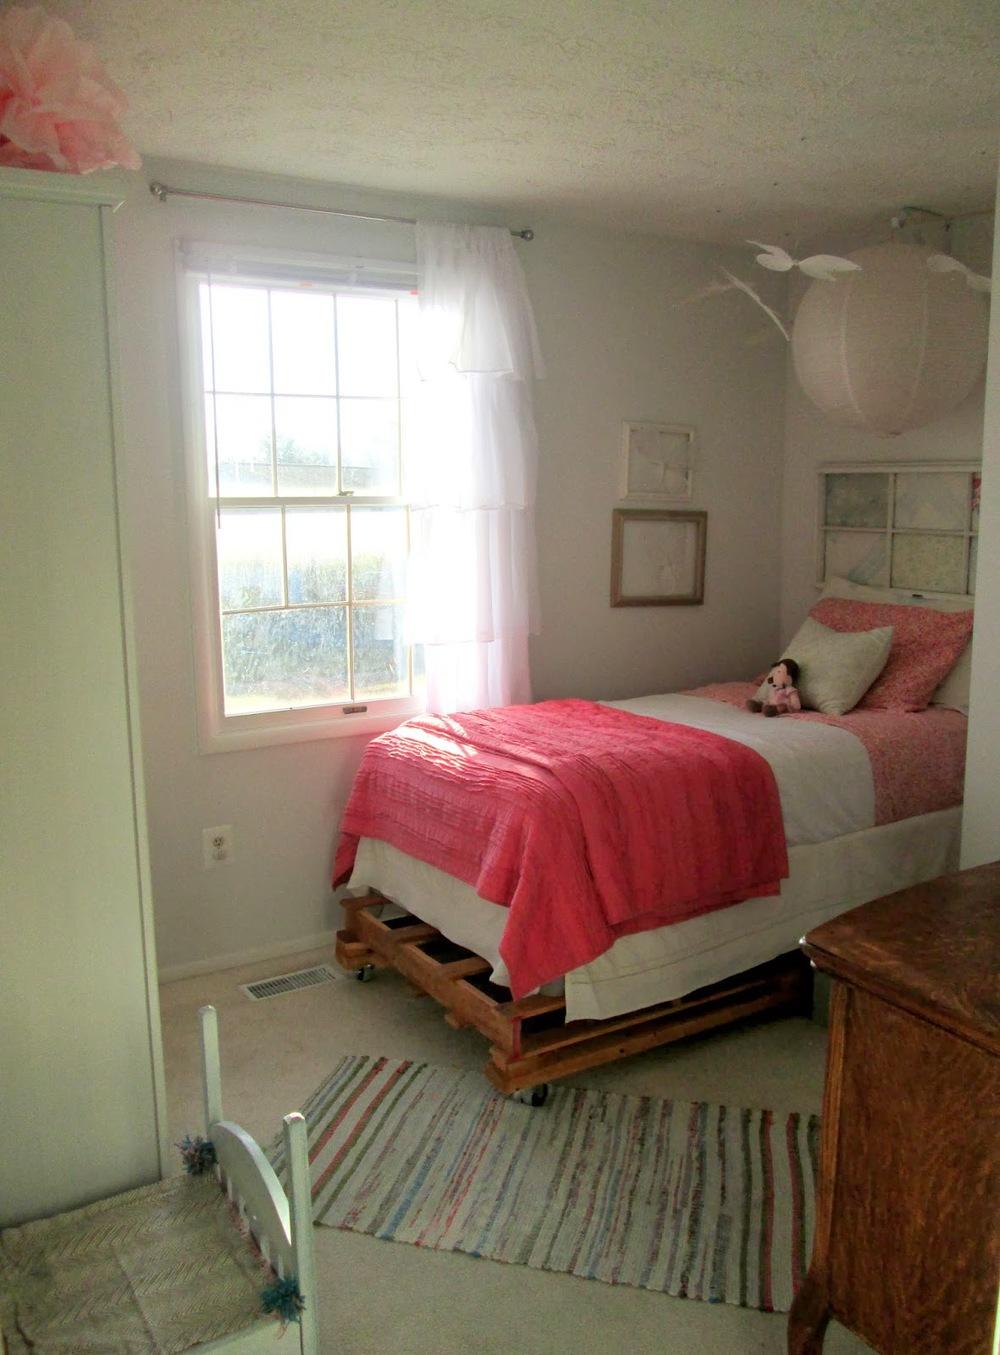 shire+room+redo9.jpg